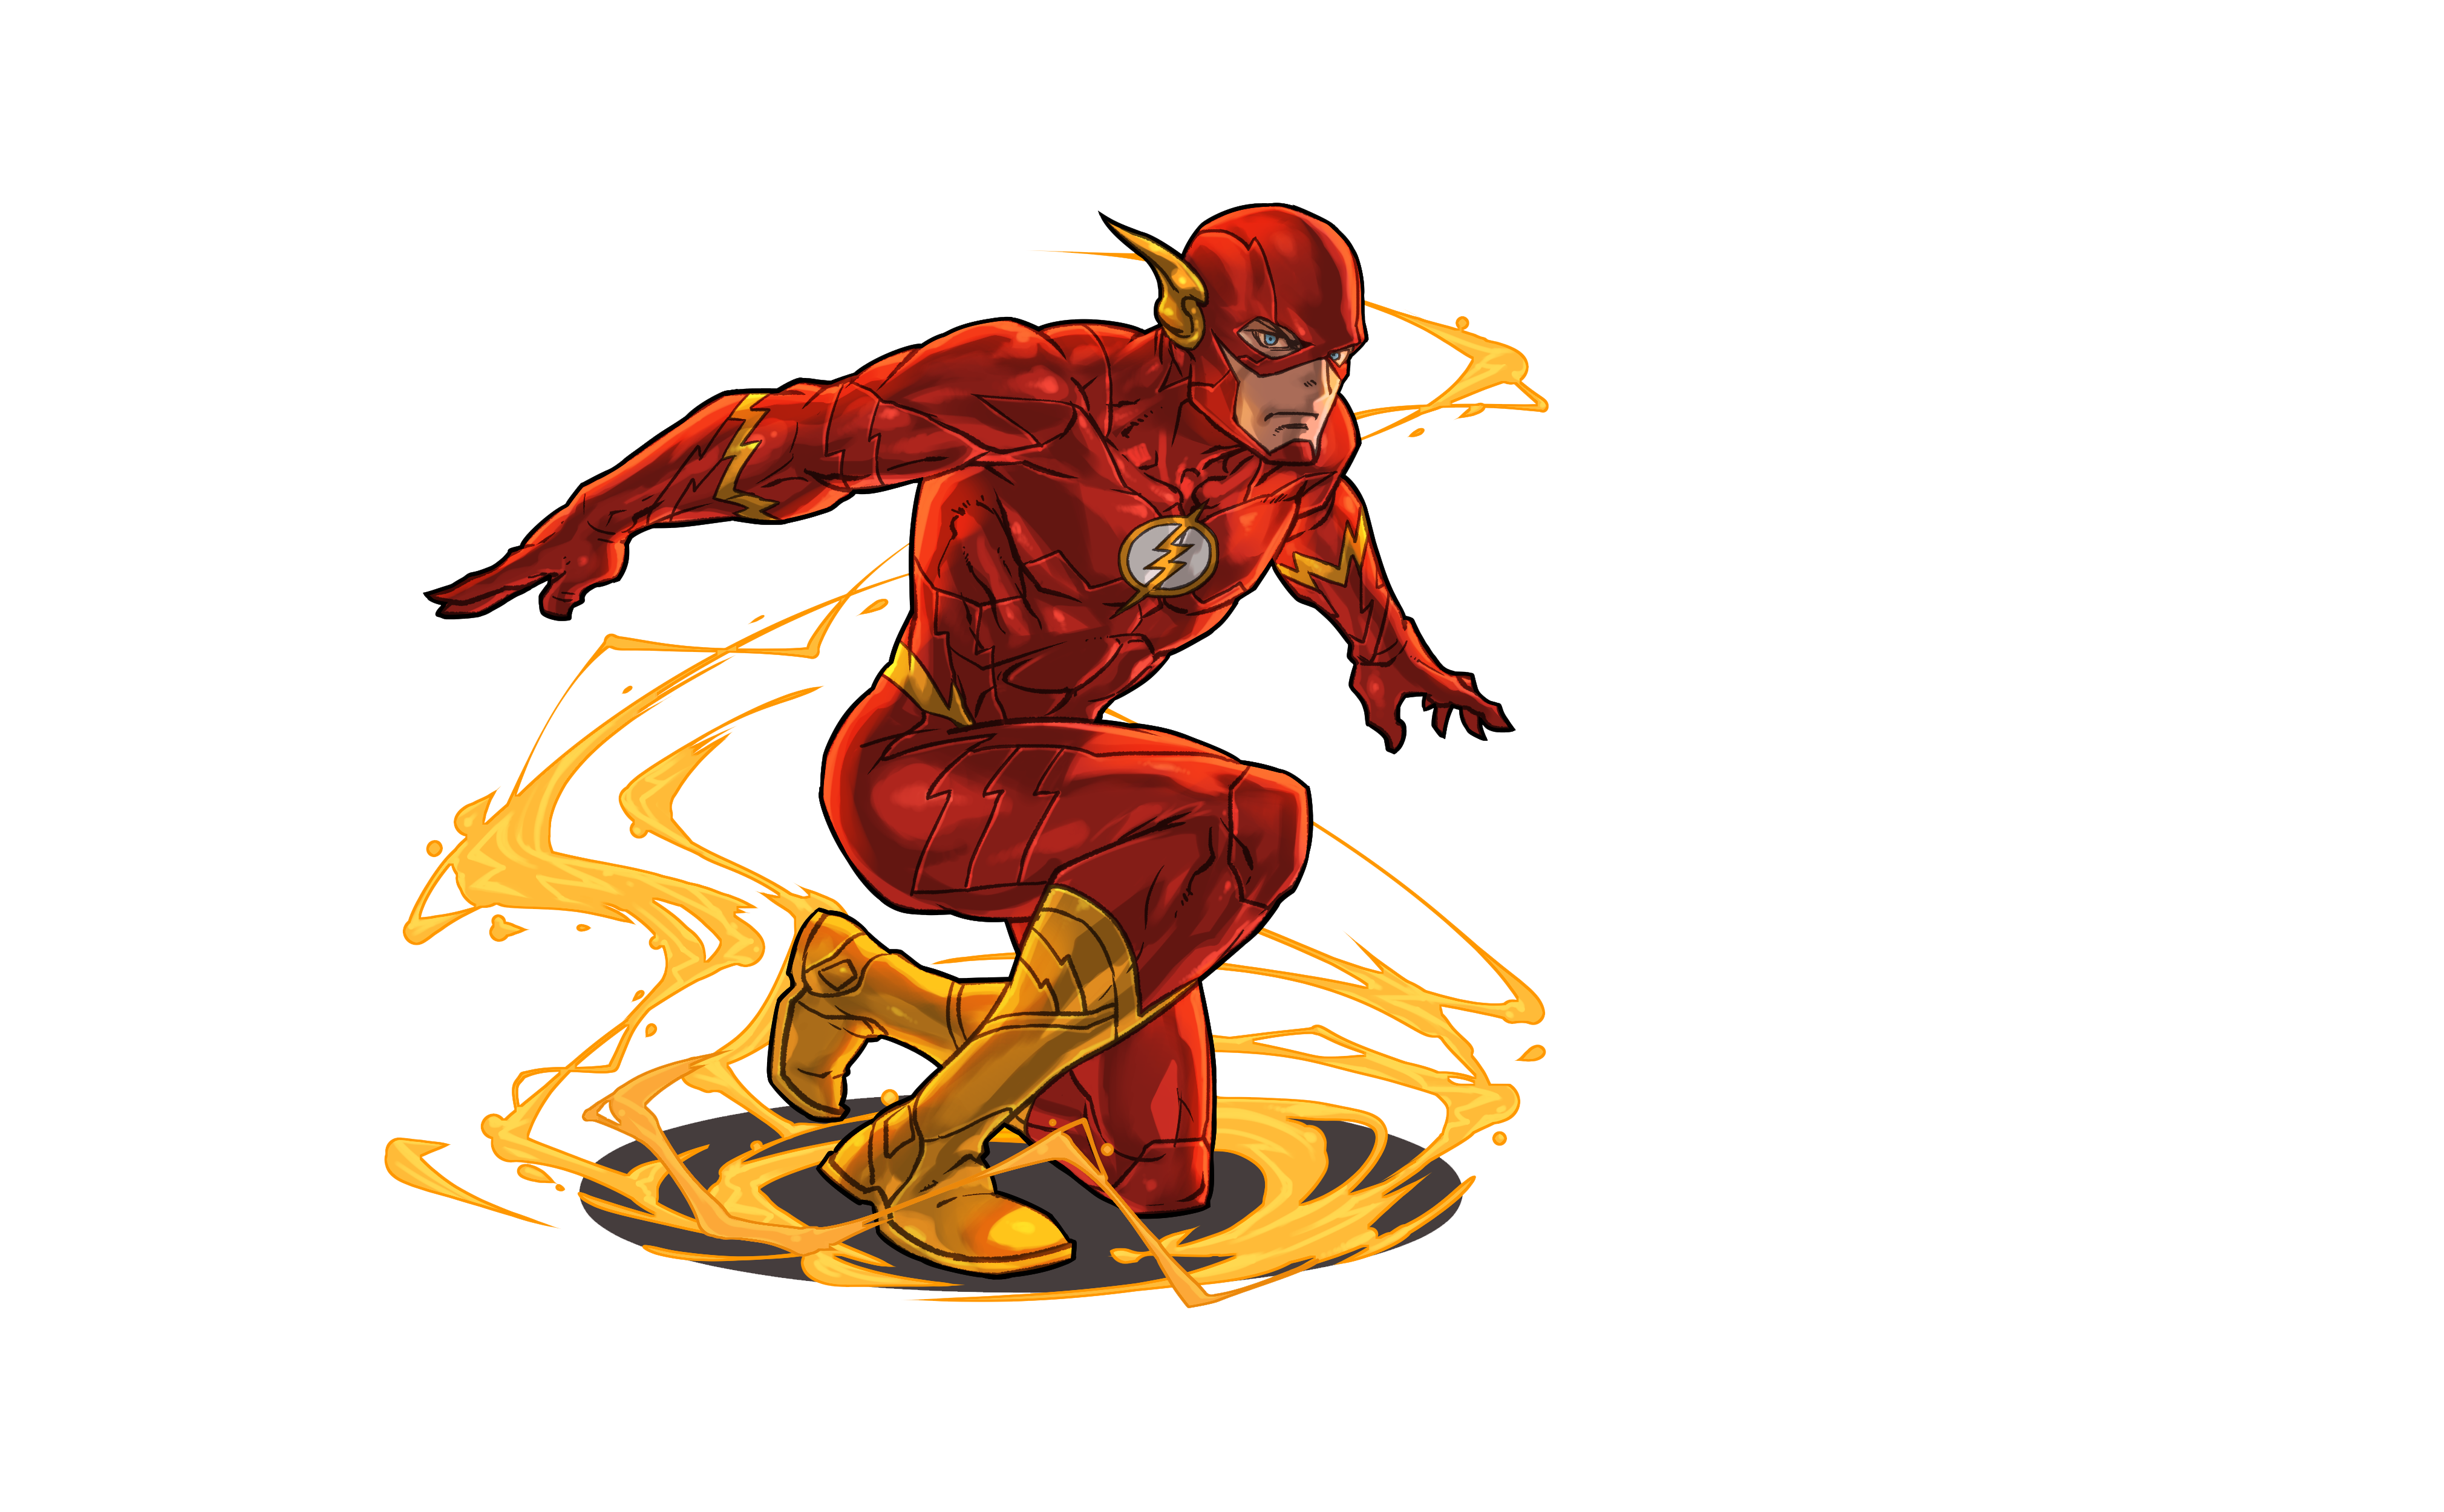 Flash Free Png Image PNG Image - Flash HD PNG